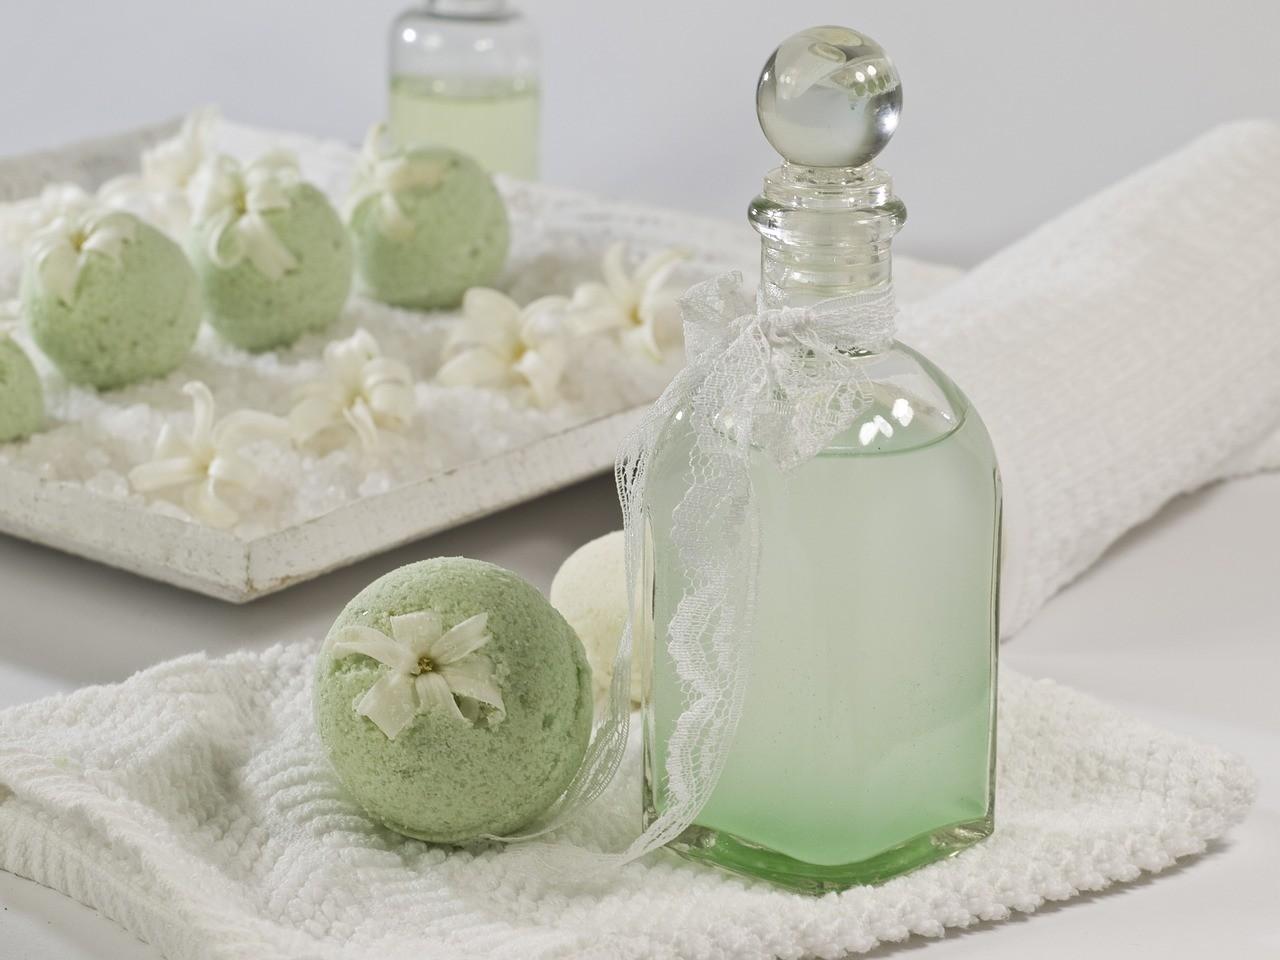 Шипучие бомбочки для ванны